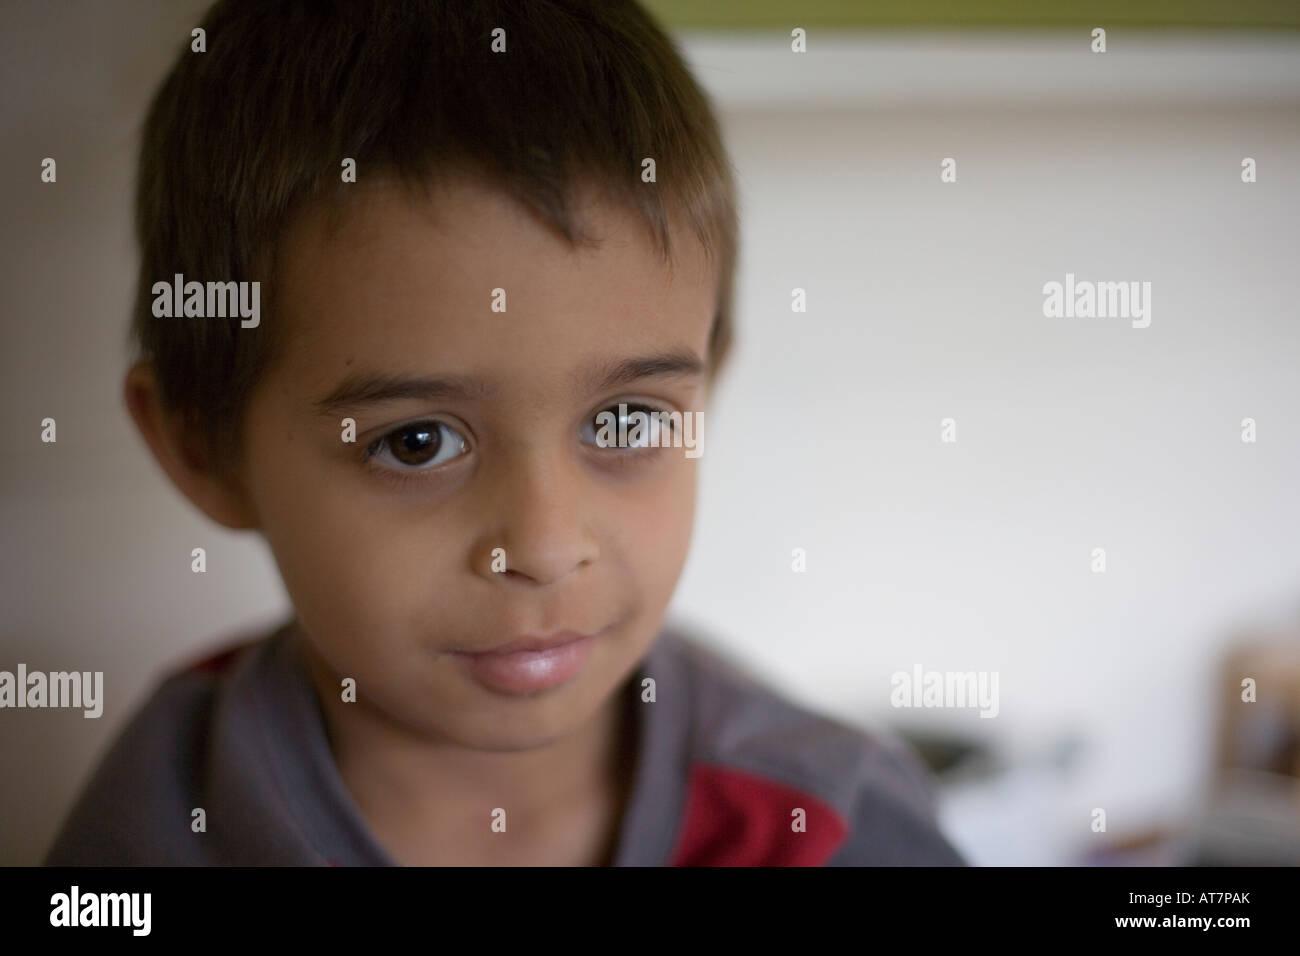 pimpandhost boys Enigmatic boy - Stock Image